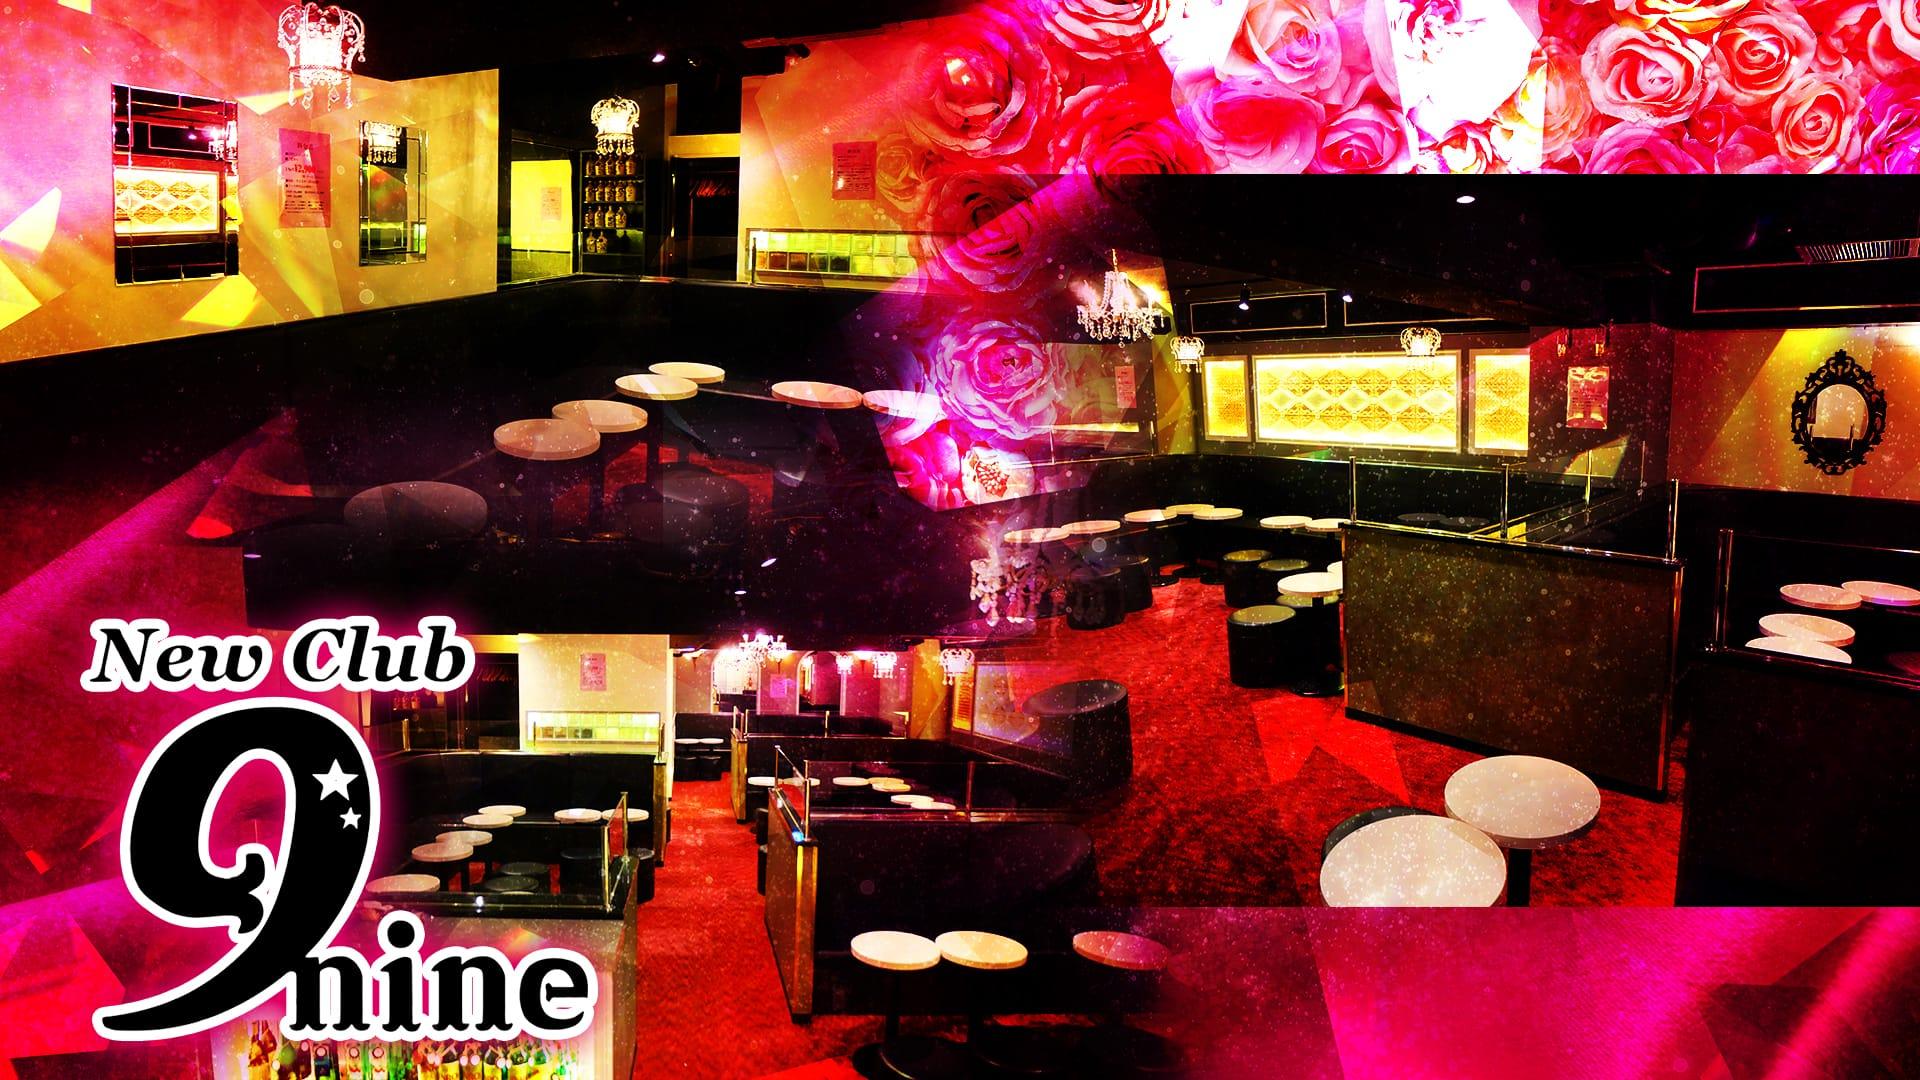 New Club 9nine[ナイン] 門前仲町 キャバクラ TOP画像